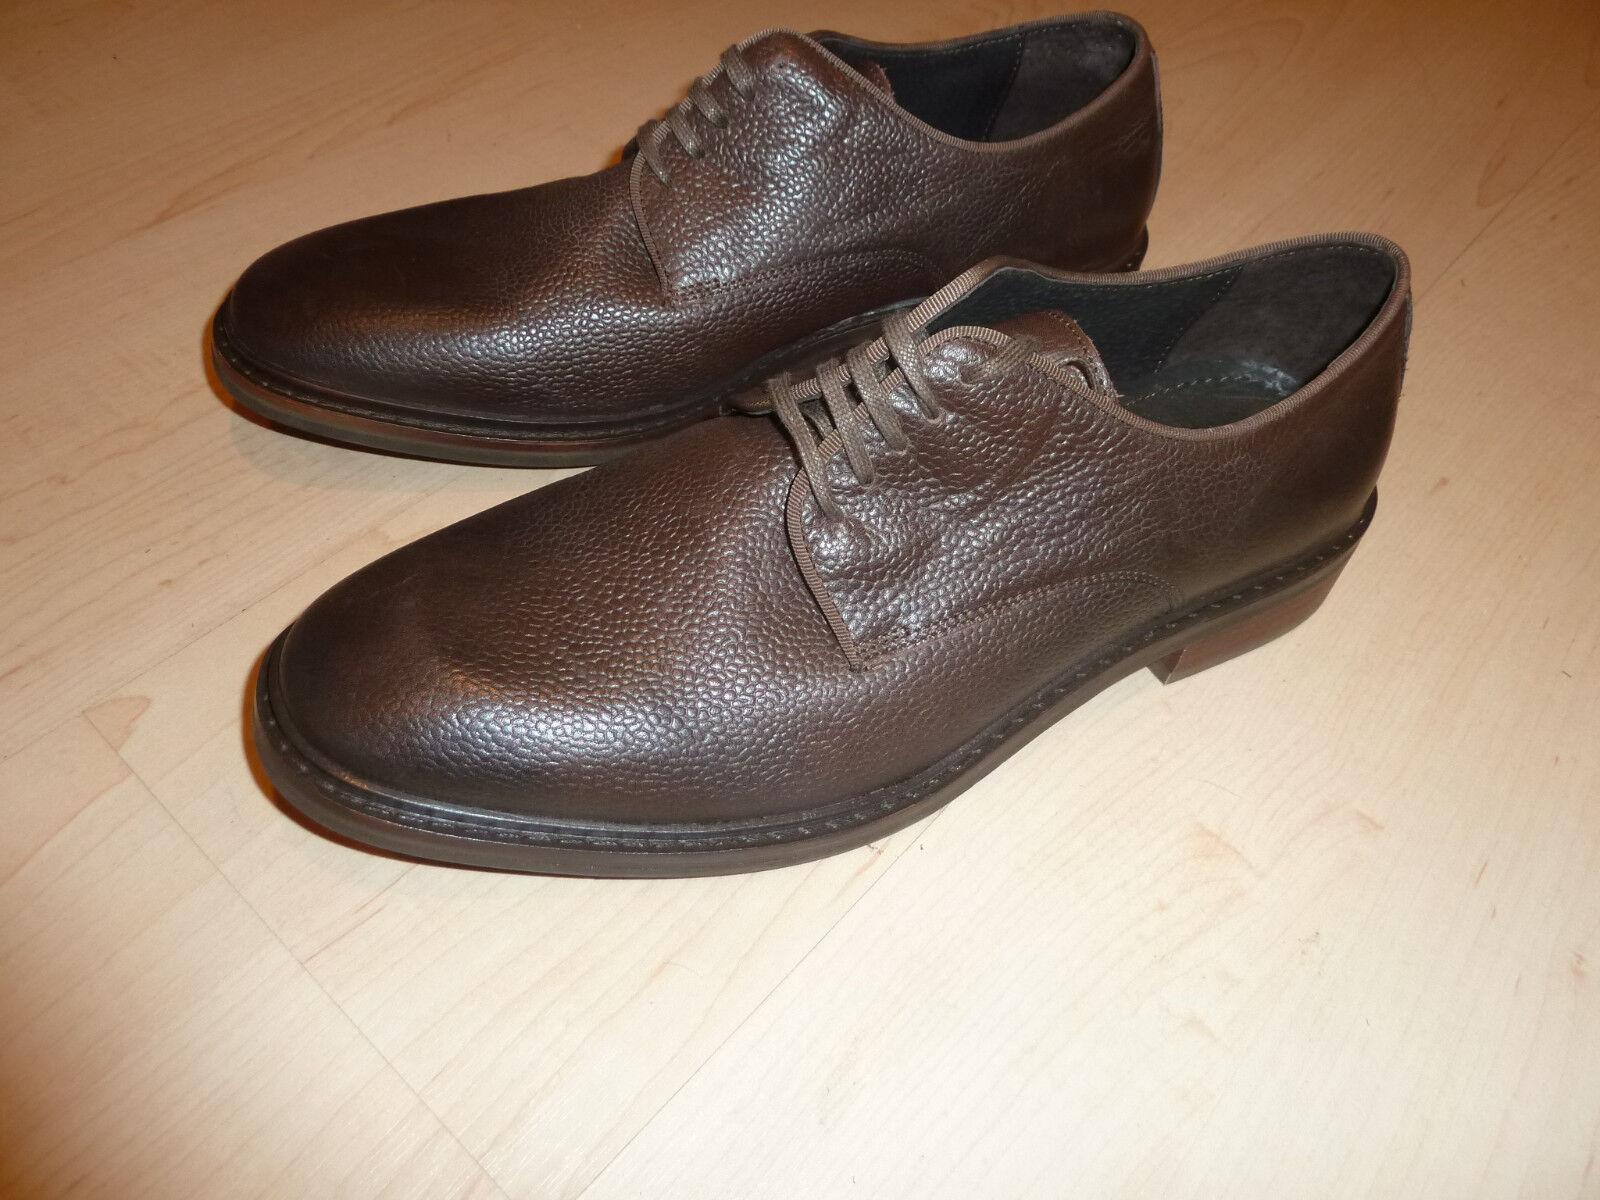 NEW  350 KENNETH COLE schuhe Portugal Sz 13 braun Leather Box